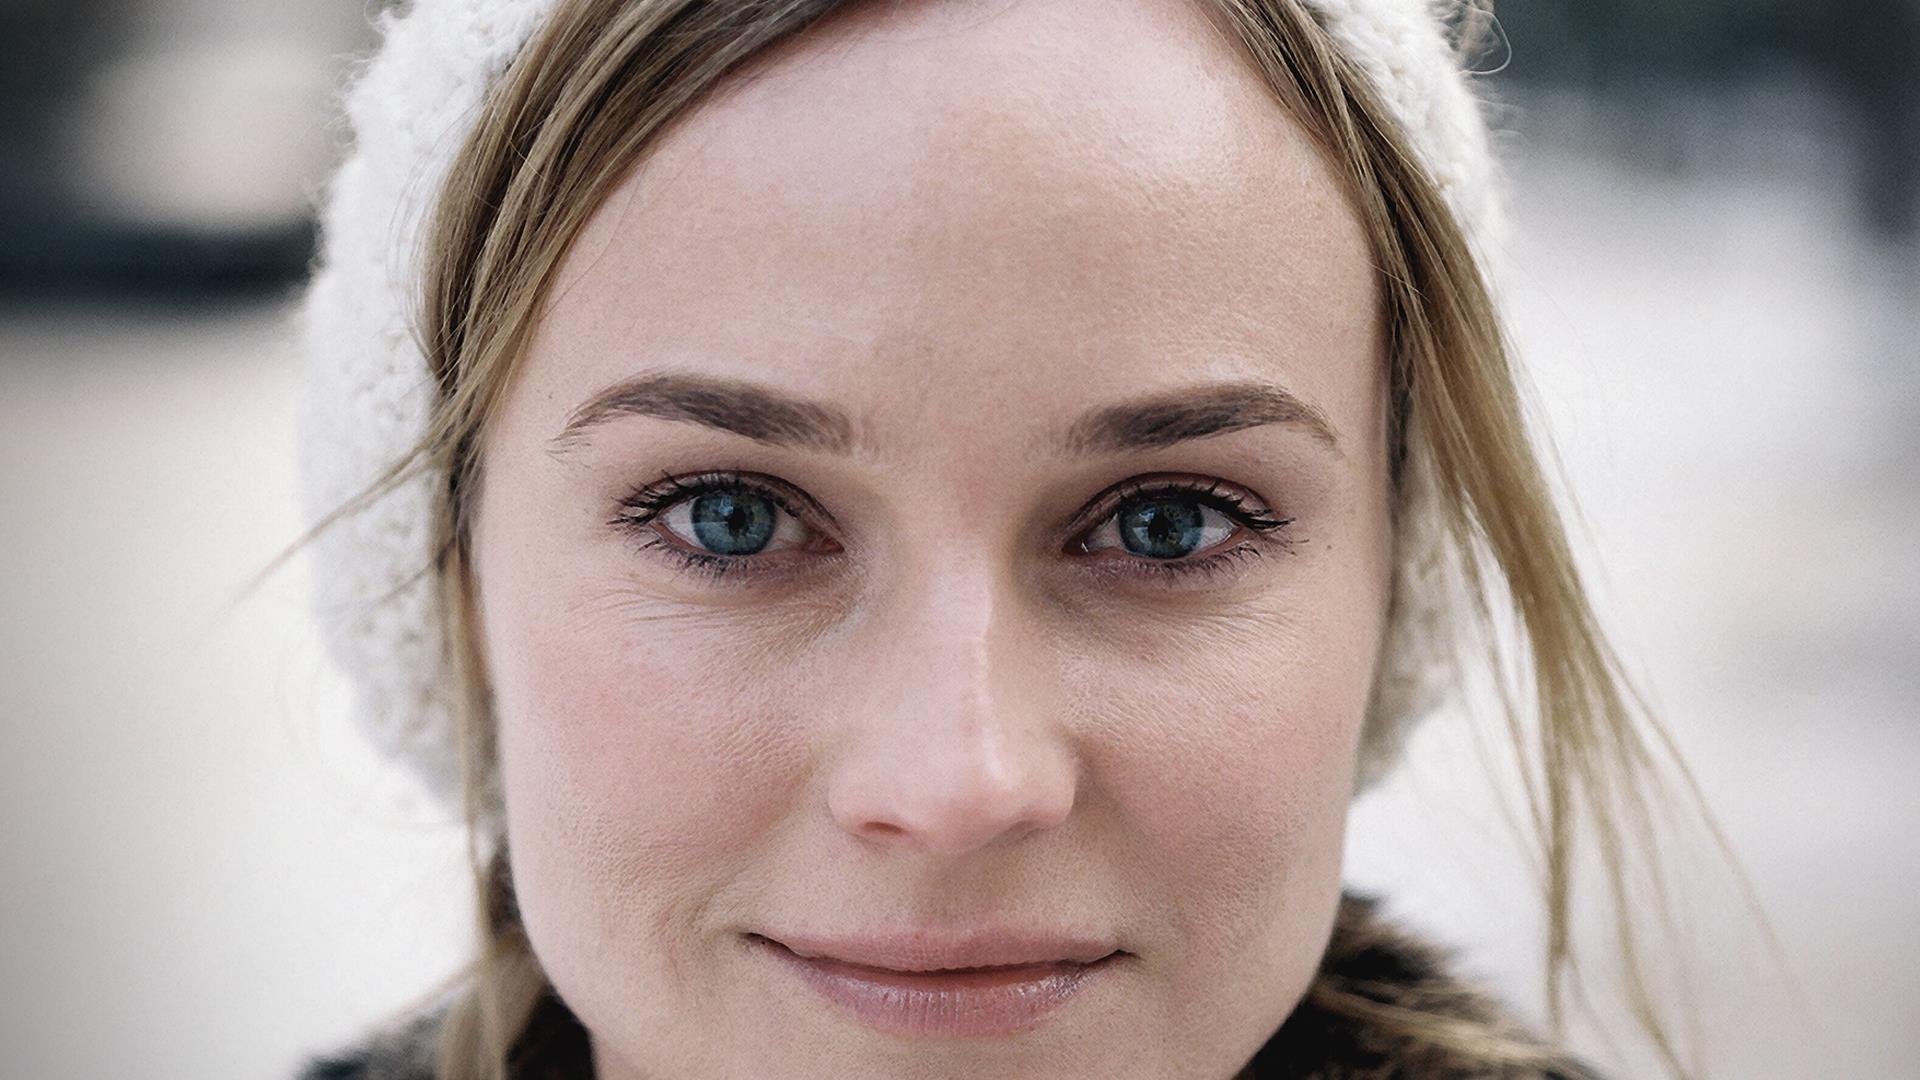 Diane Kruger Smiling Ultra Face Closeup Wallpaper